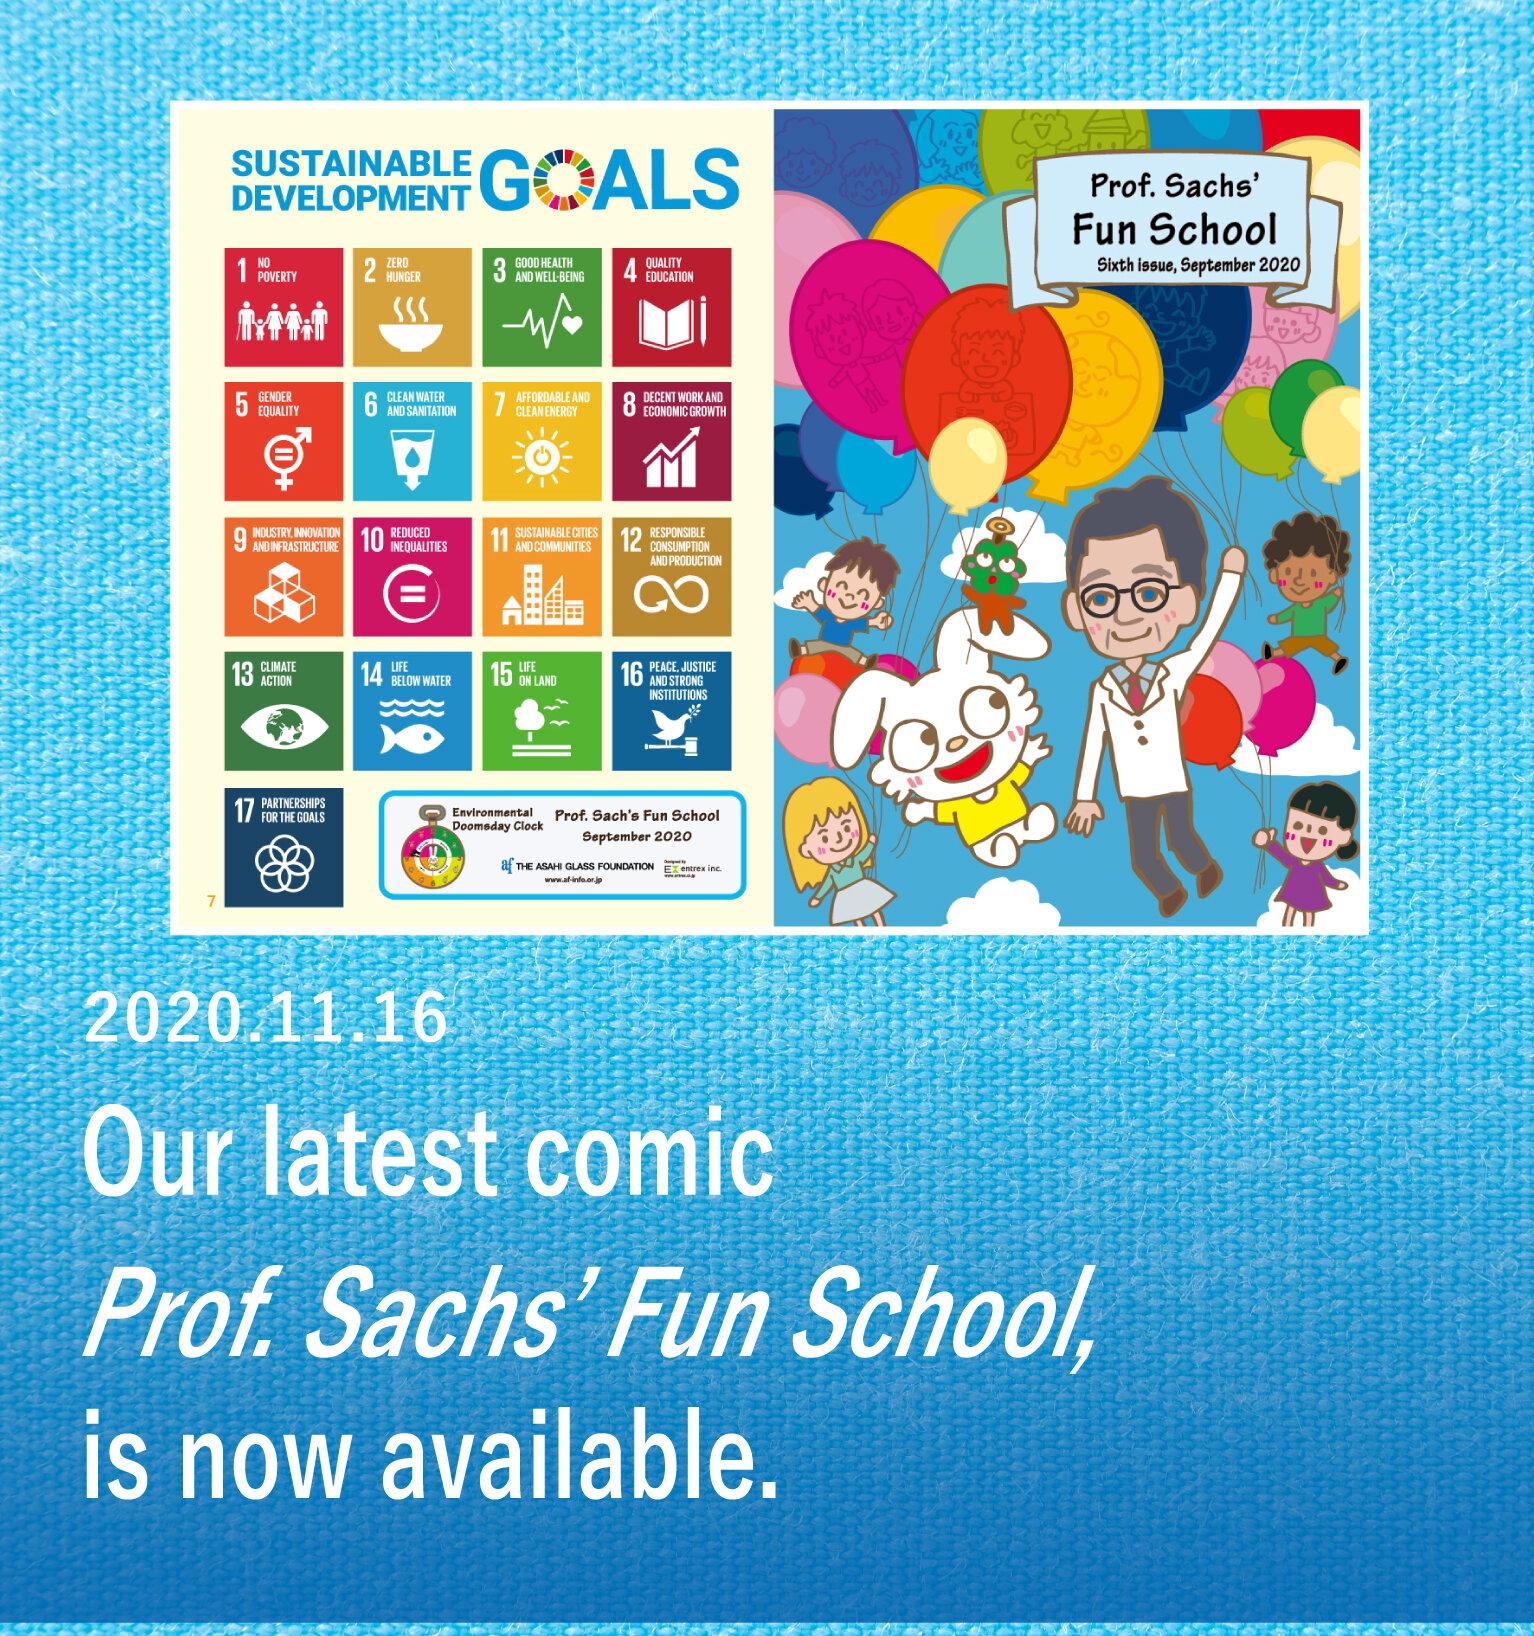 Prof. Sachs' Fun School were published